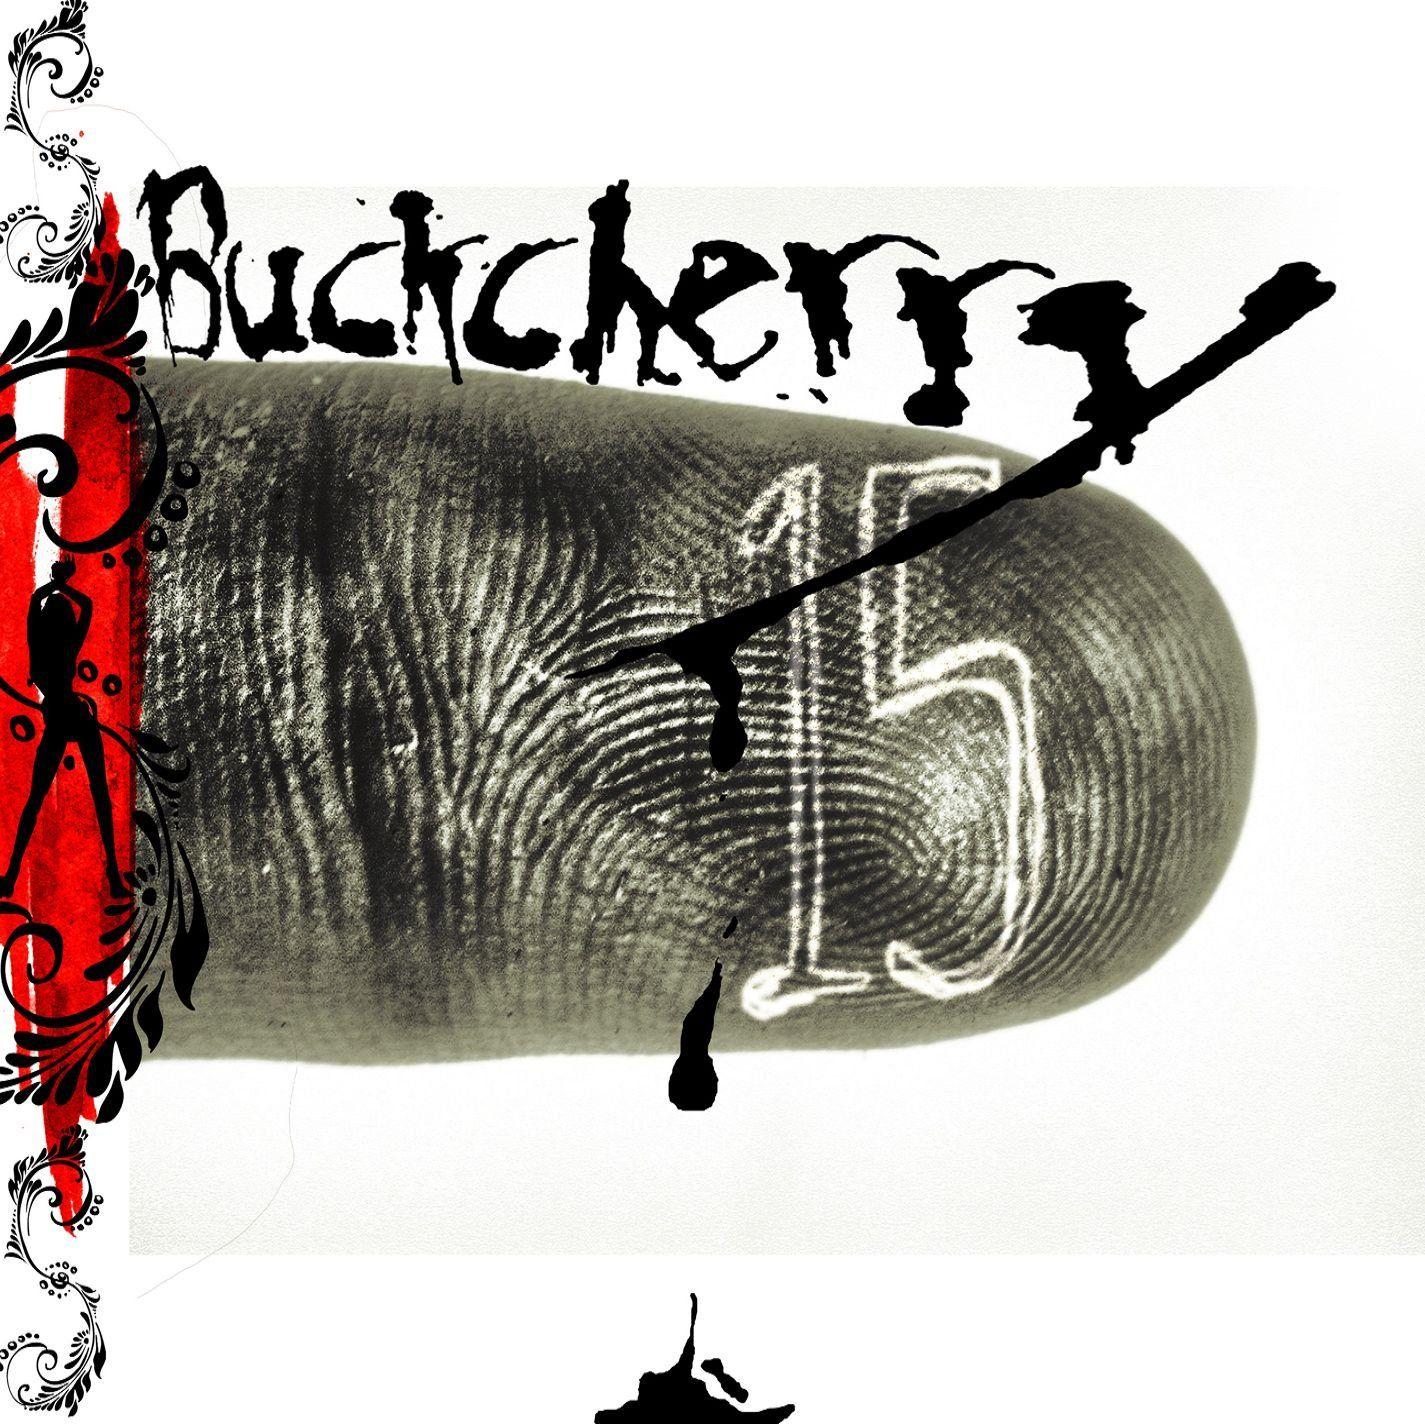 Buckcherry - 15 album cover